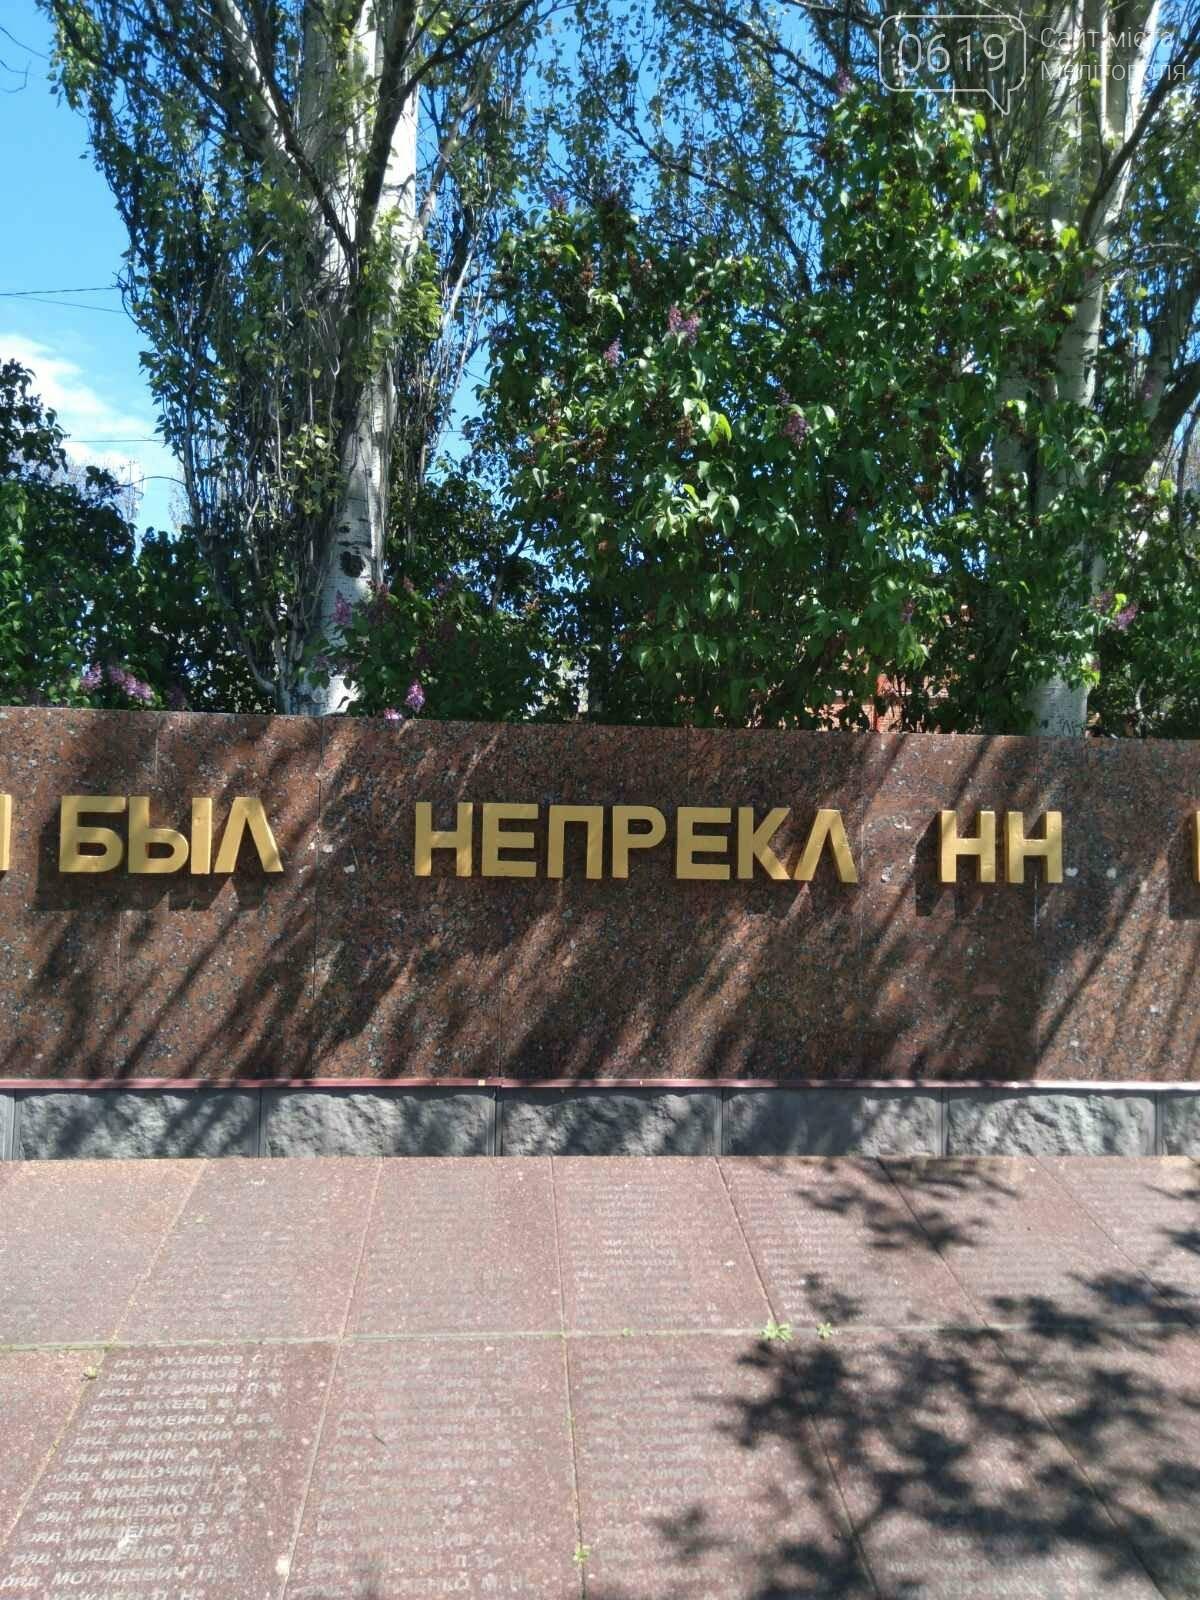 Вандалы срывают буквы на плитах Братского кладбища